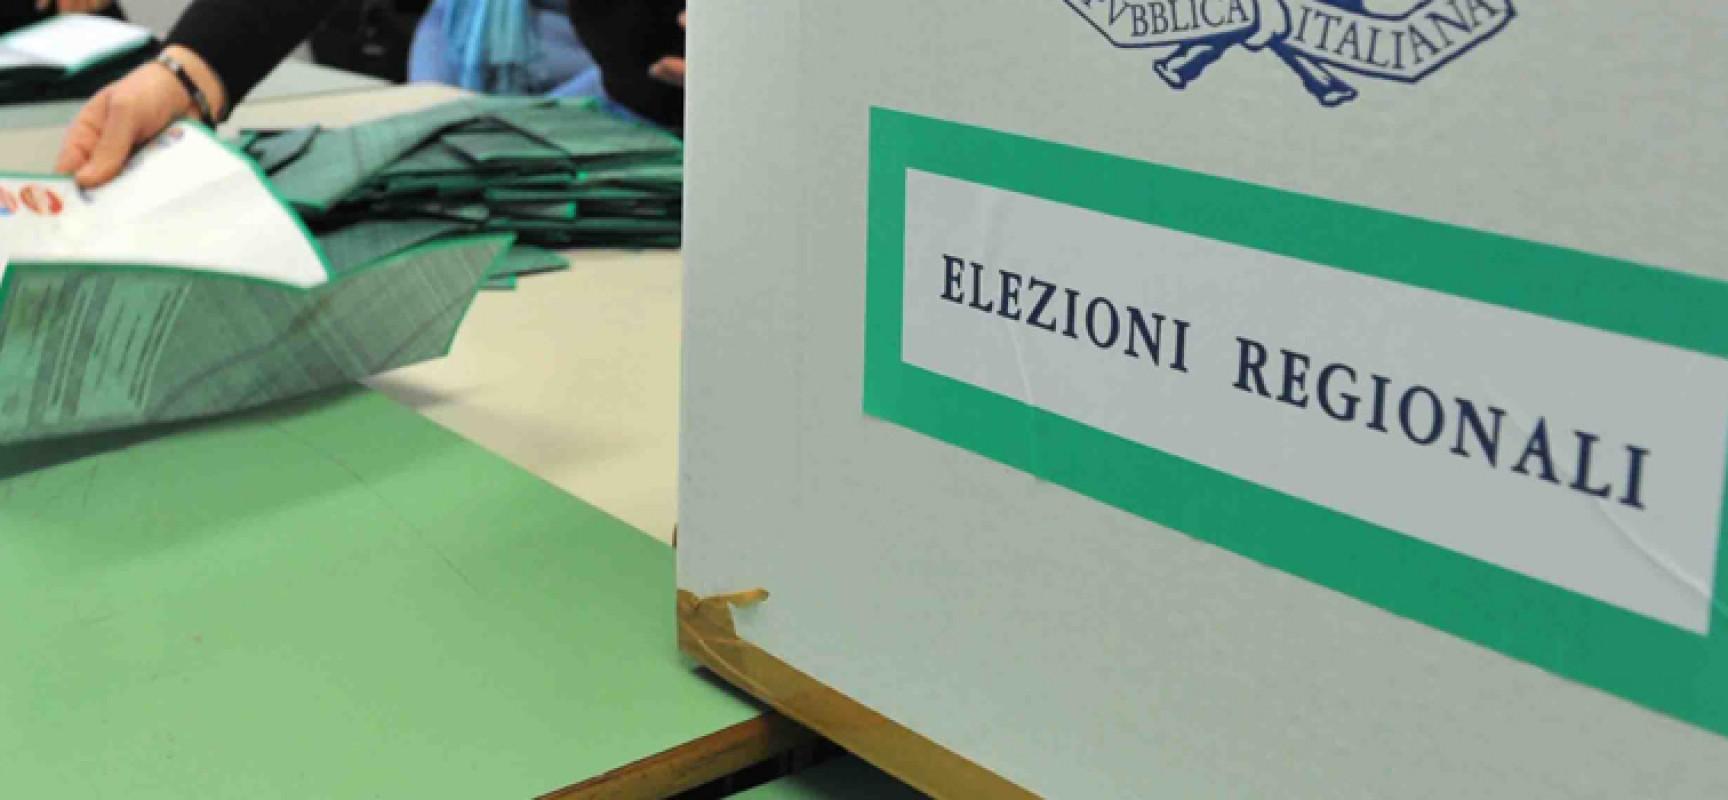 Undici candidati biscegliesi al consiglio regionale, 7 candidati presidenti, 19 liste